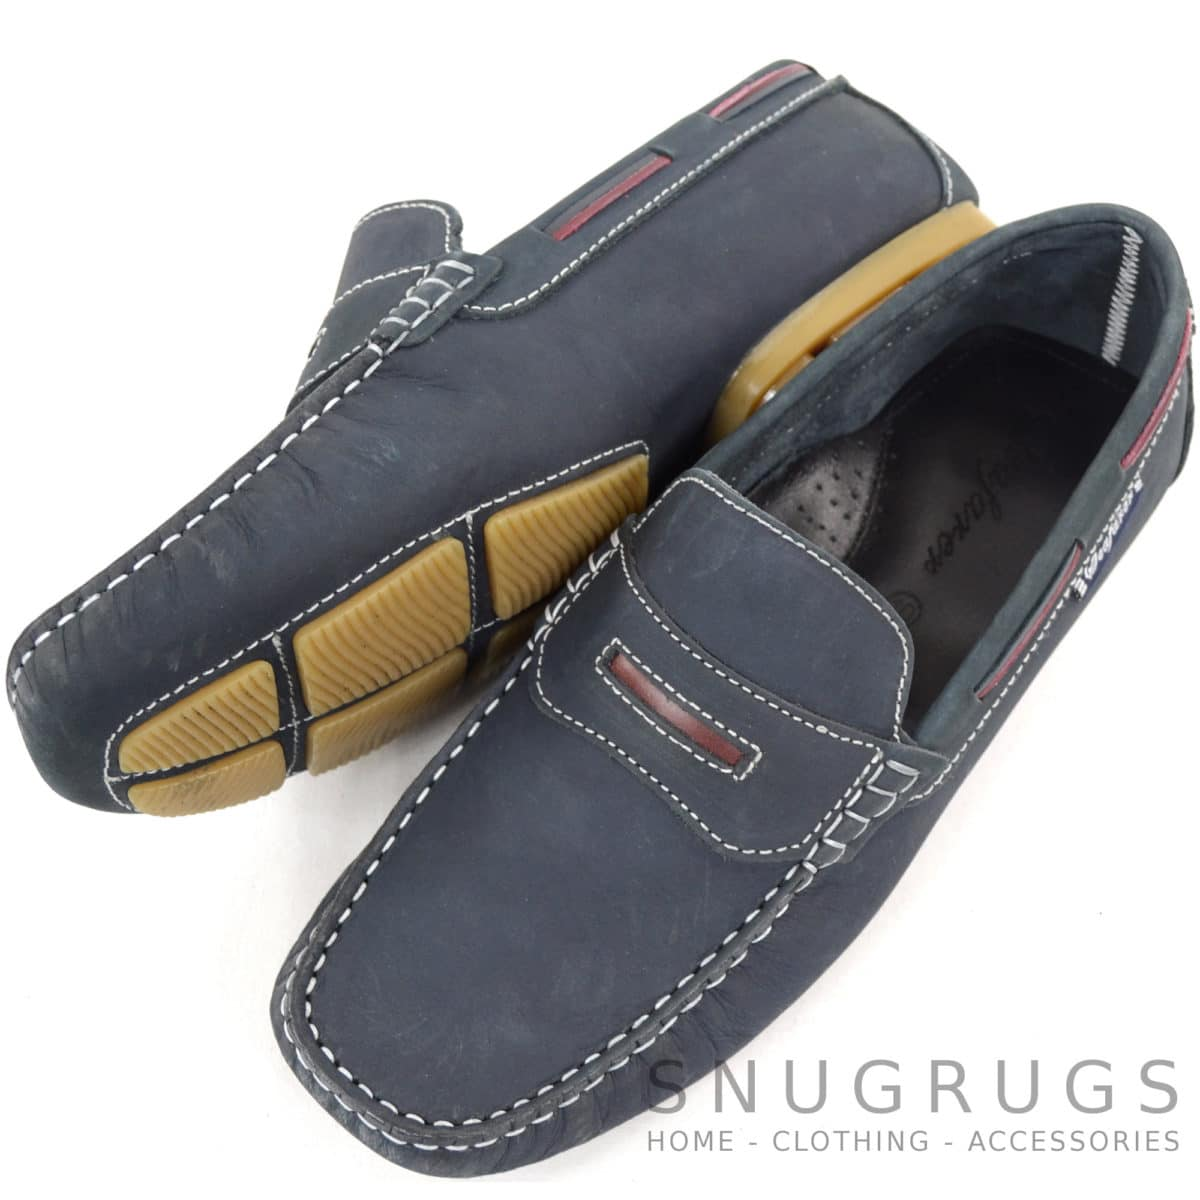 Sloop Leather Slip On Loafers - Navy